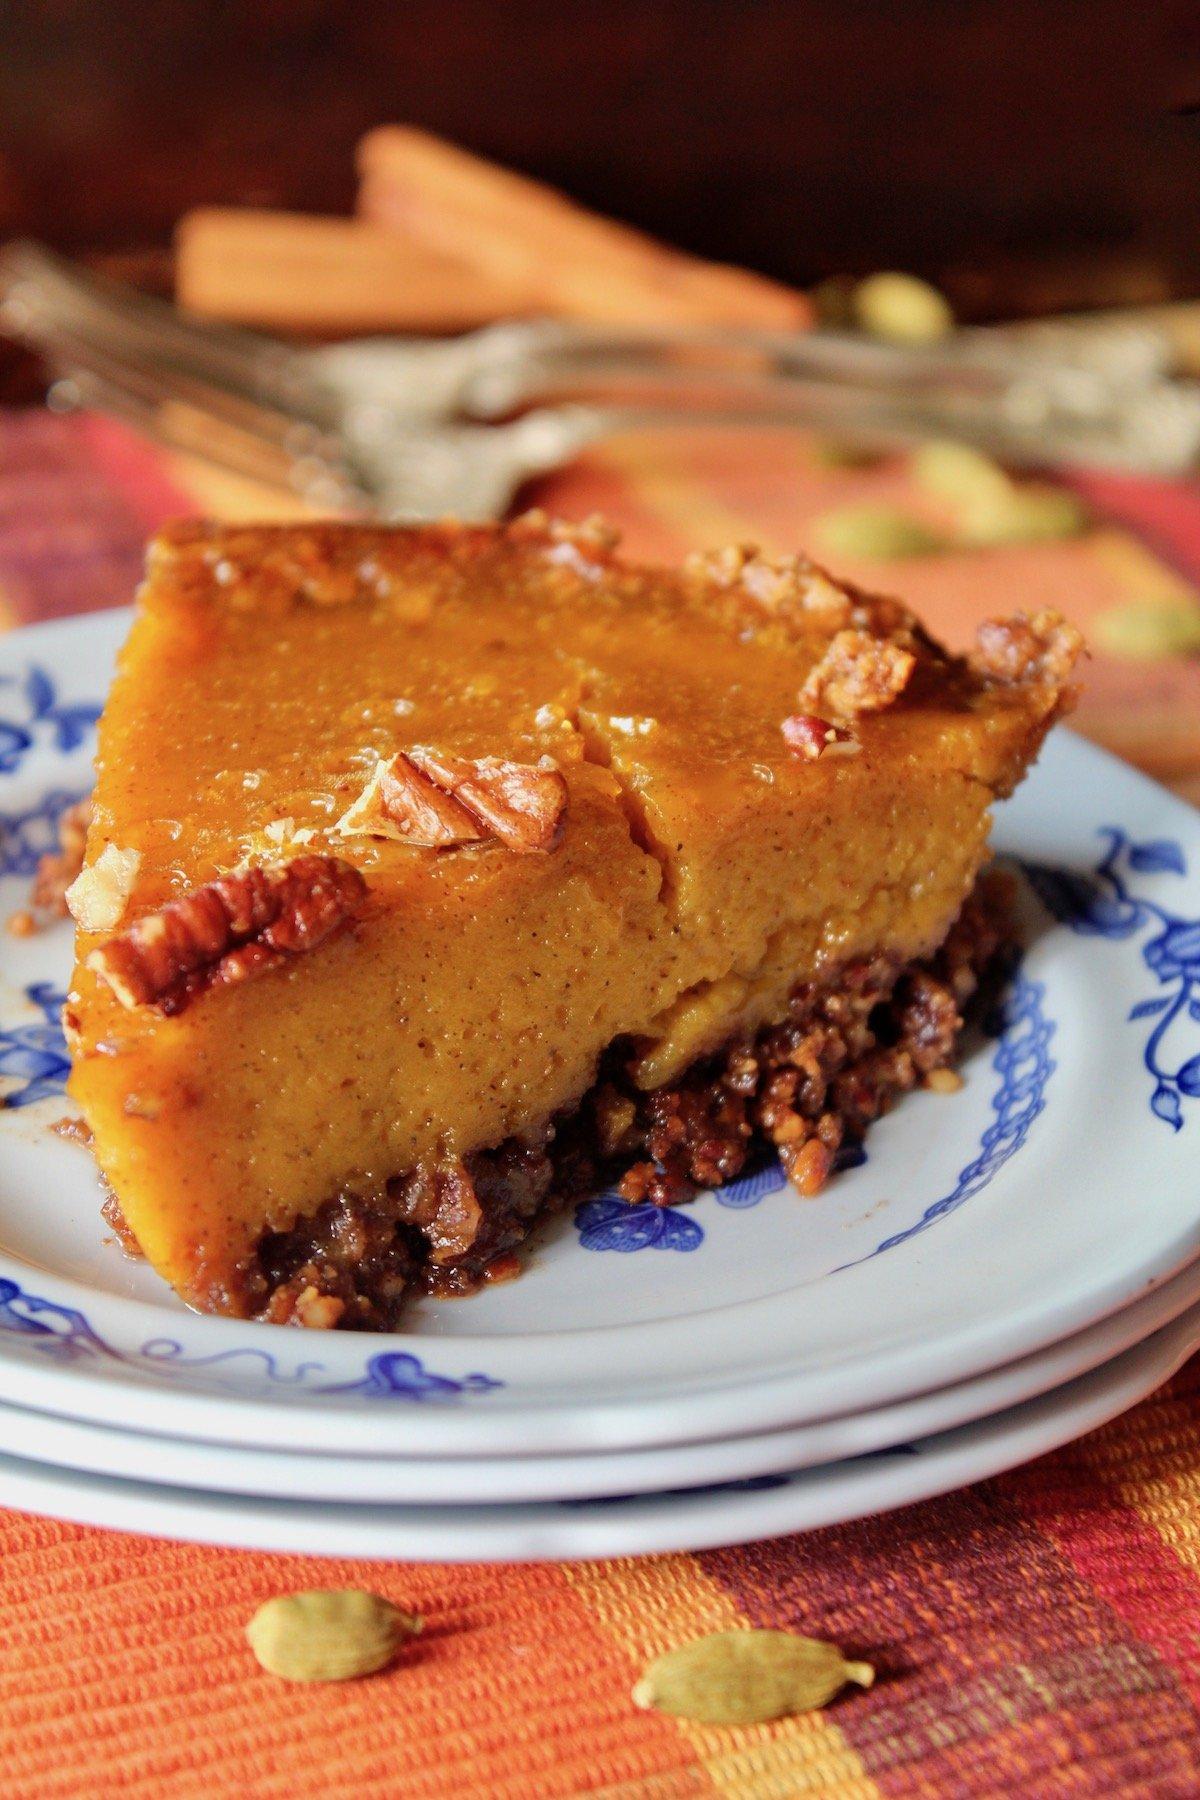 close up of a slice of pumpkin pie